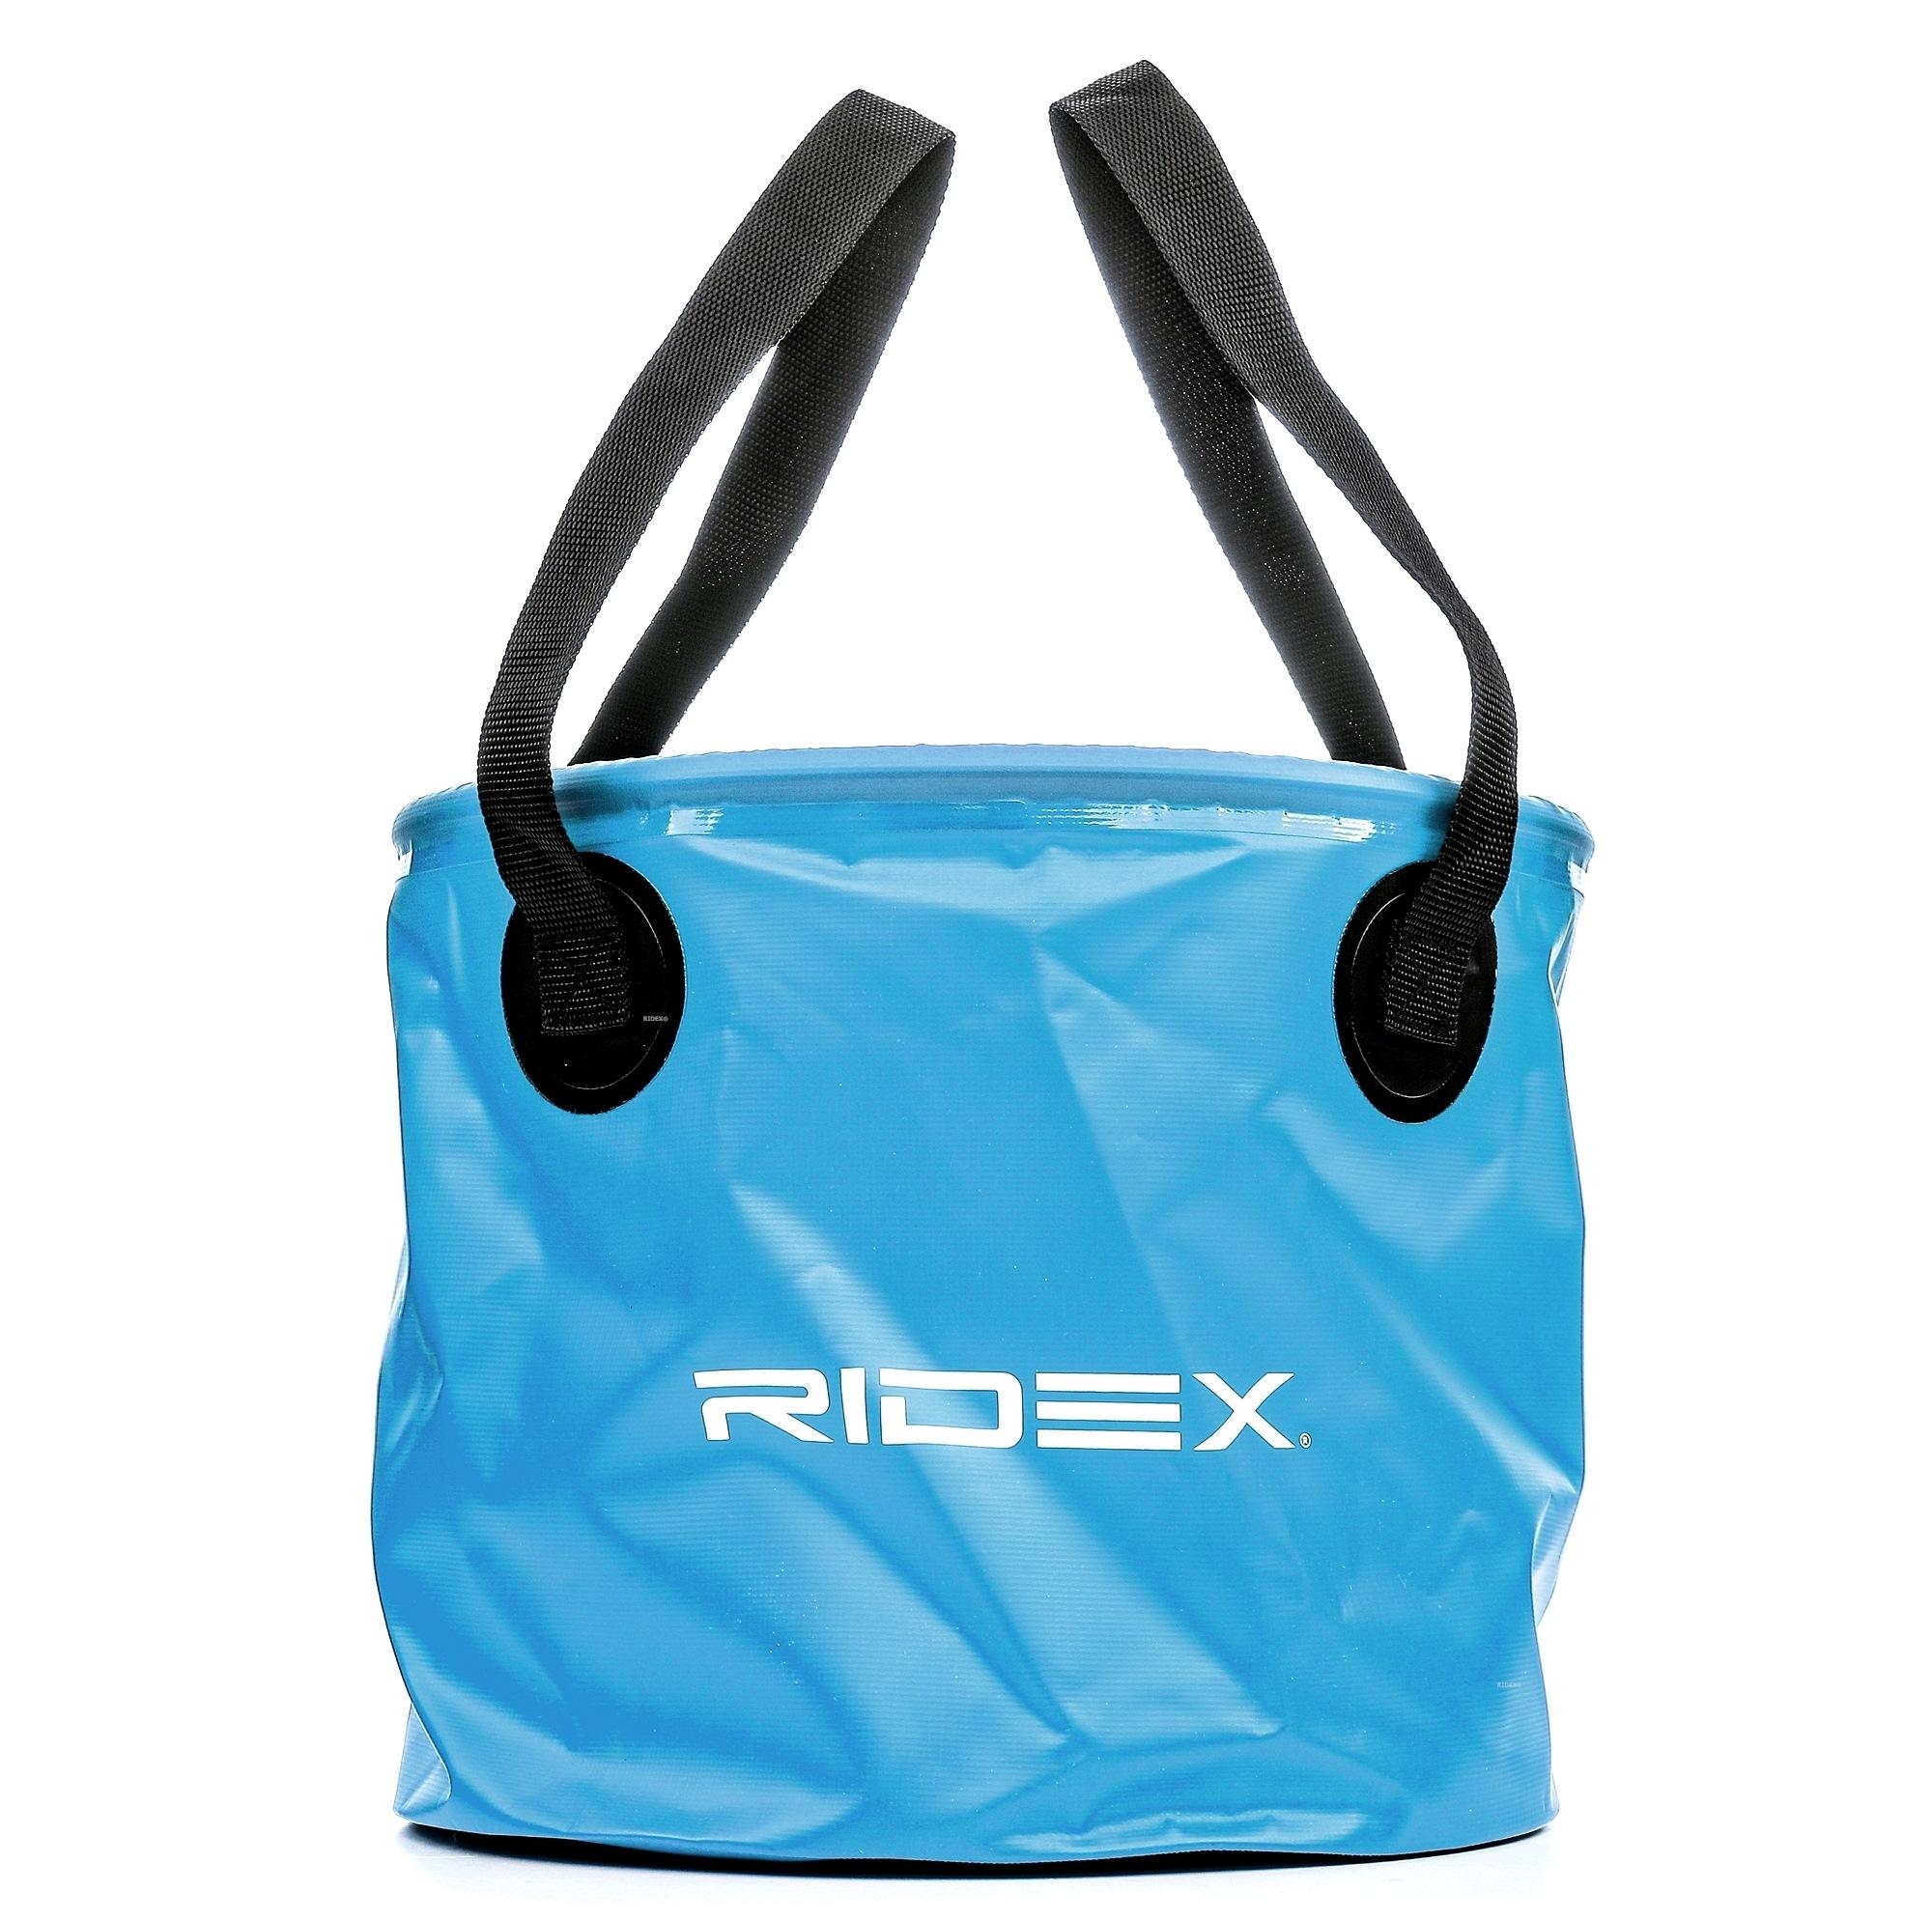 Folding bucket RIDEX 100185A0005 rating